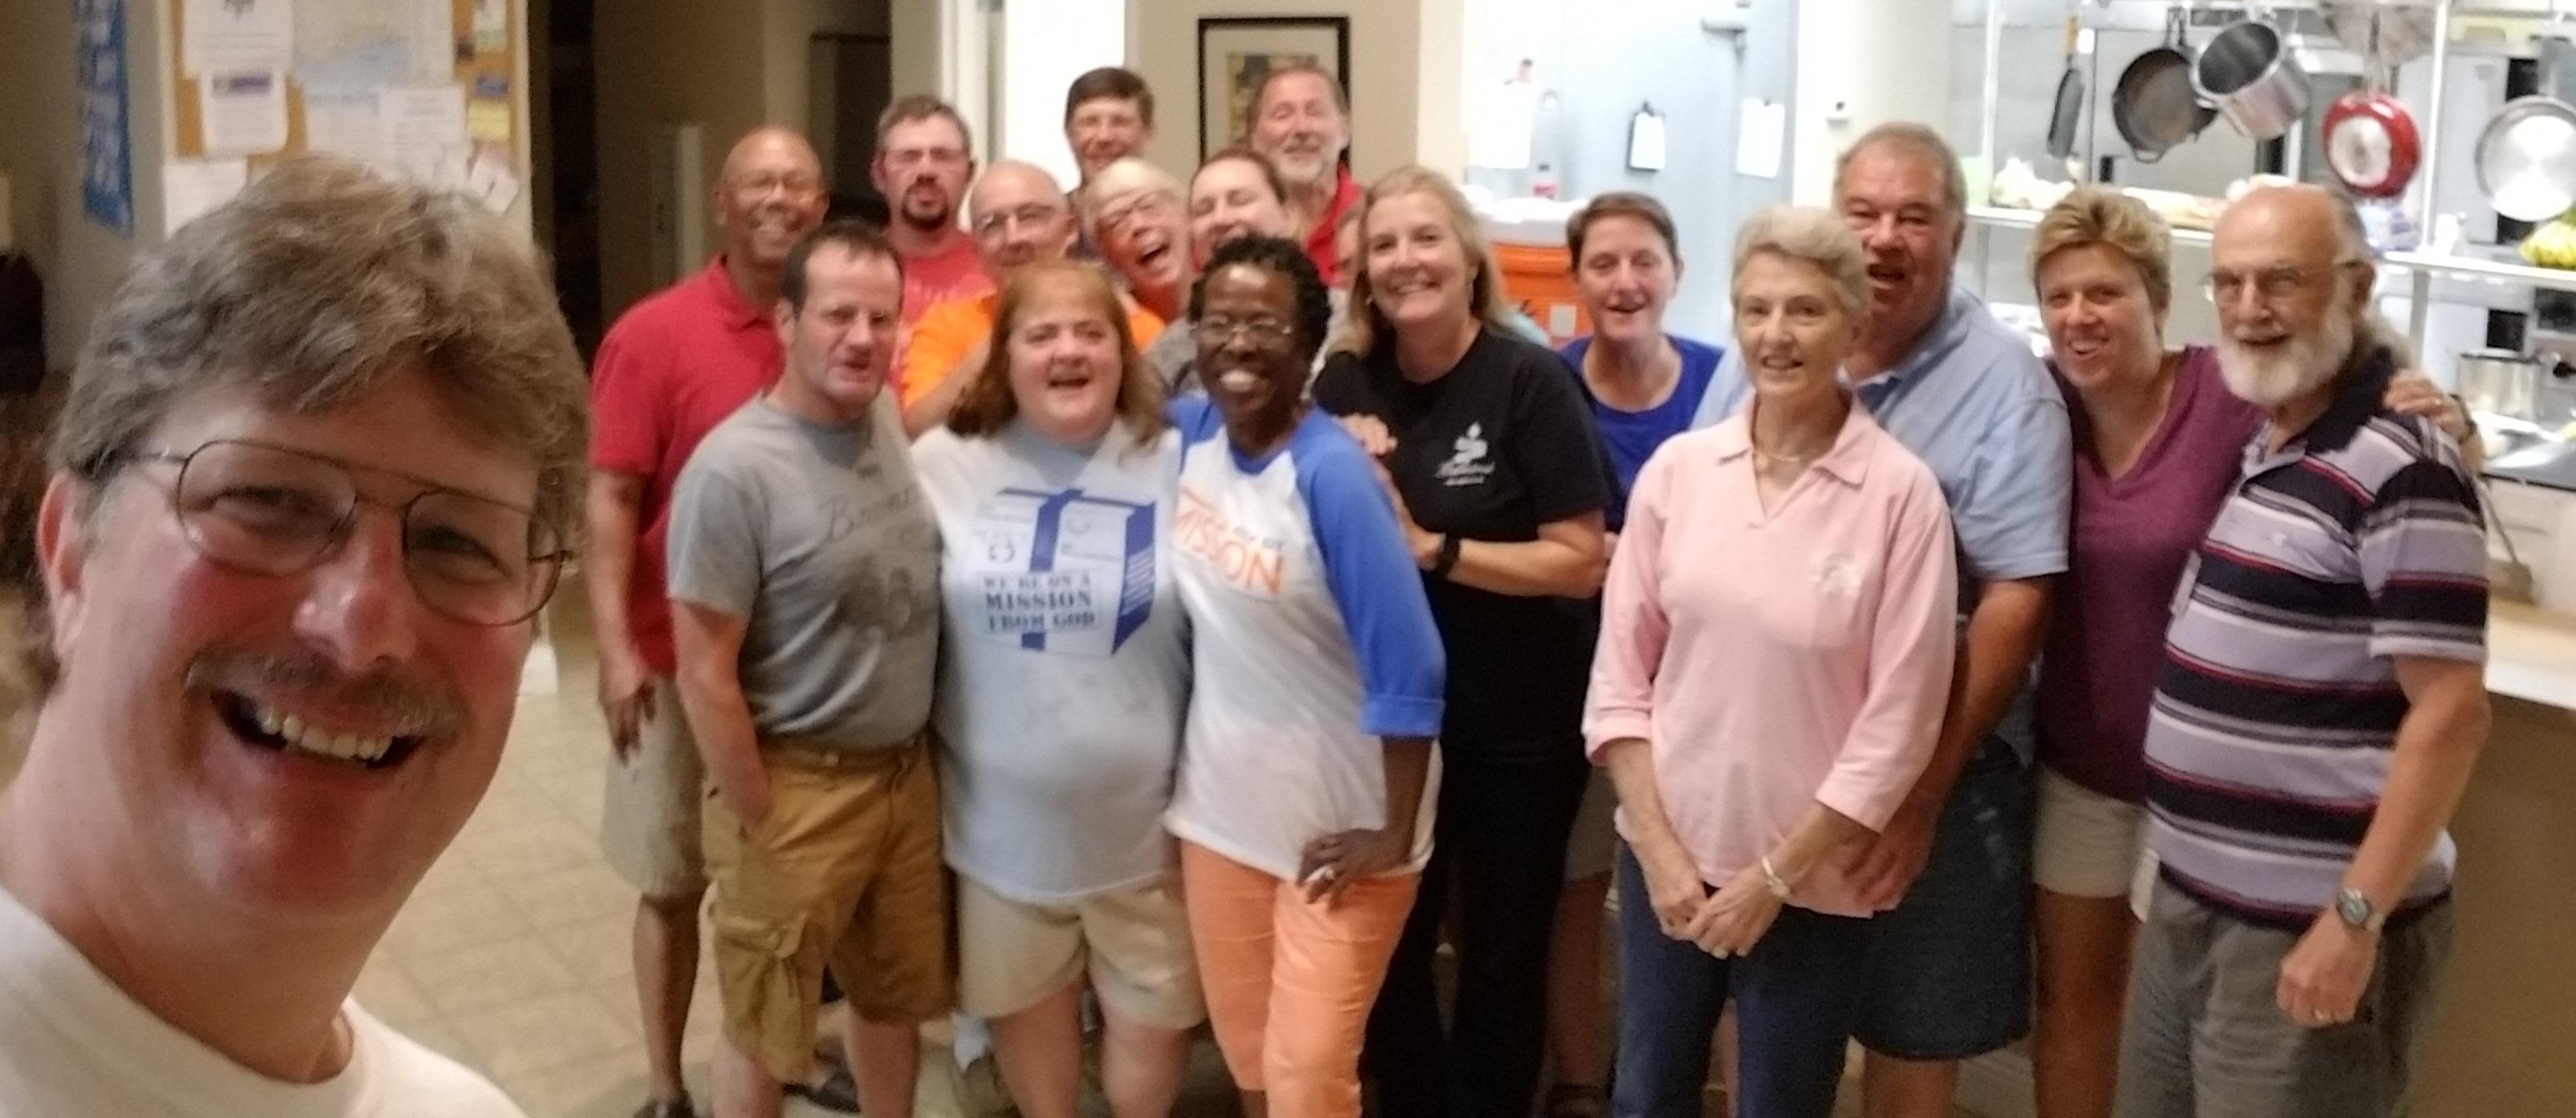 2018 Volunteers: Peace Lutheran Church (Oshkosh, Wisconsin)